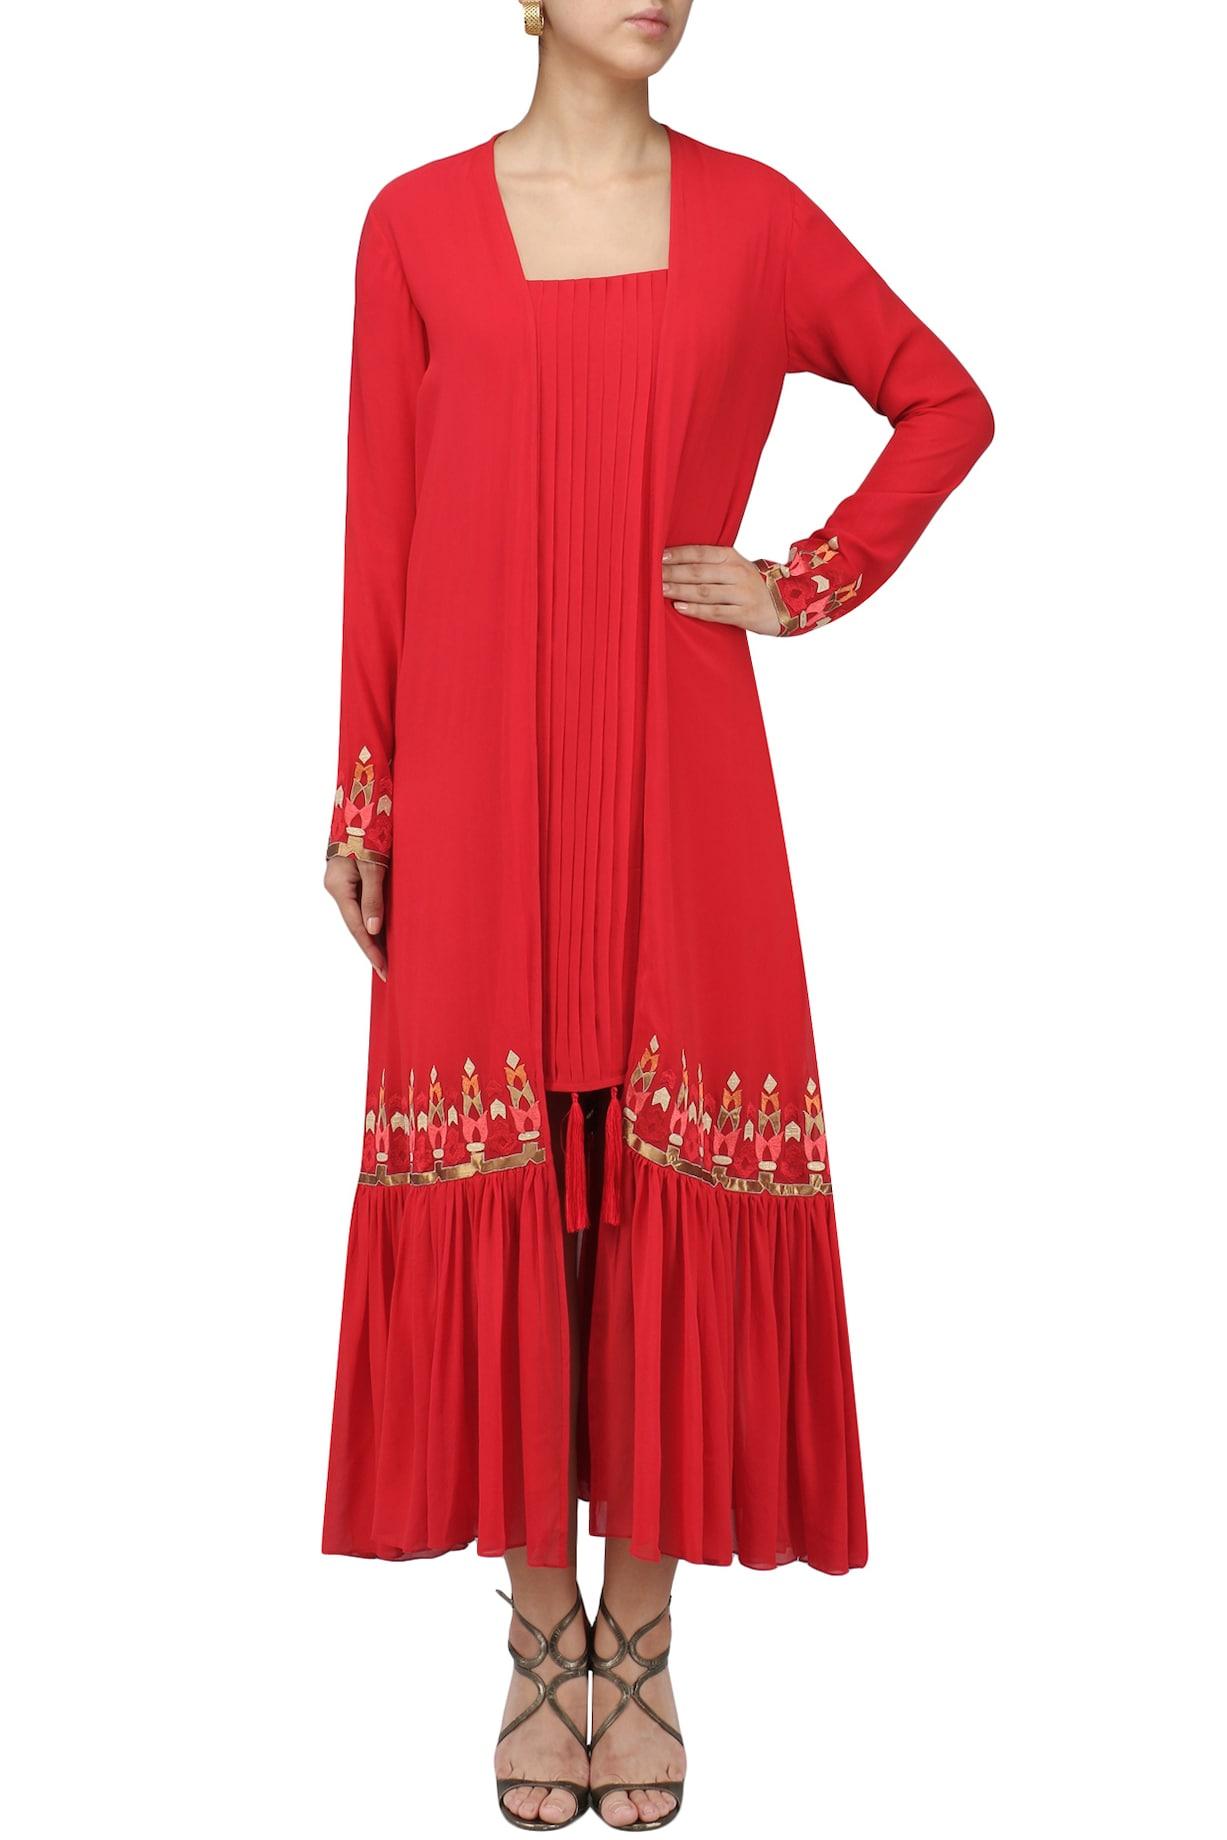 Chandni Sahi Array